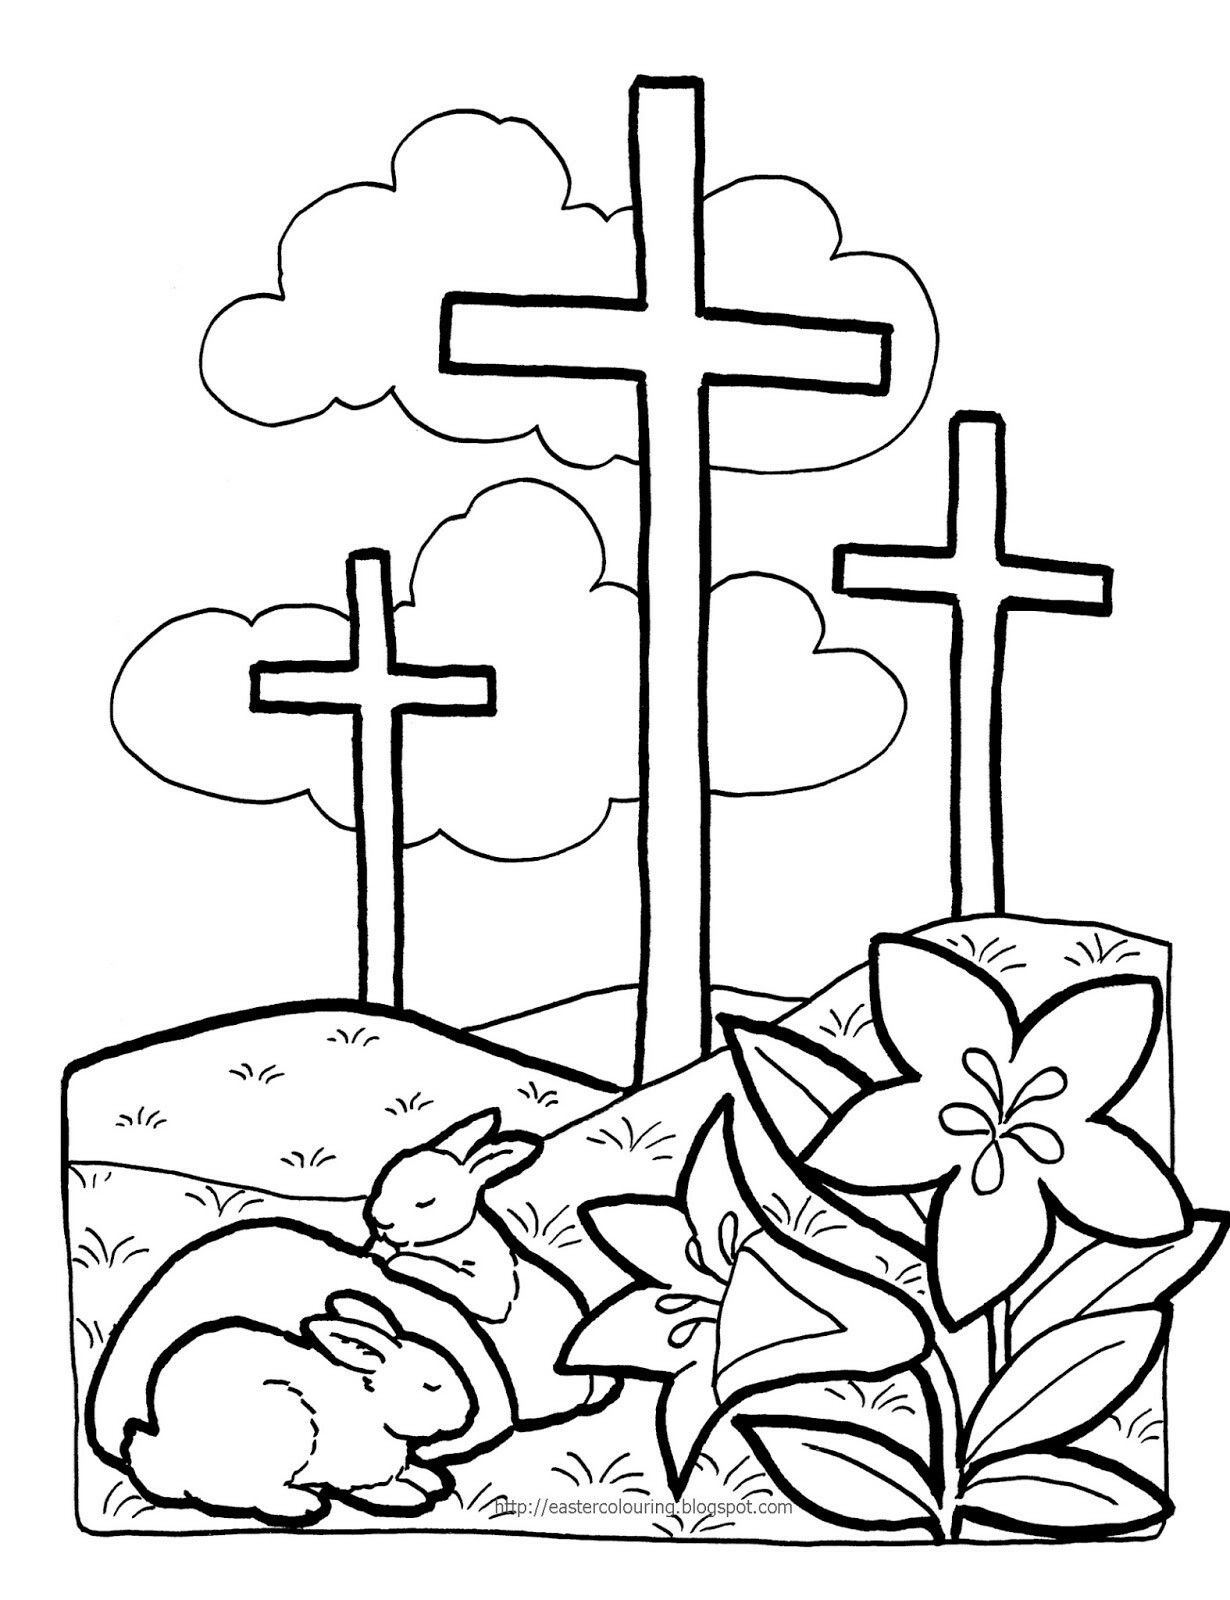 Pin von Raegan Garcia auf Coloring Pages | Pinterest | Kommunion ...